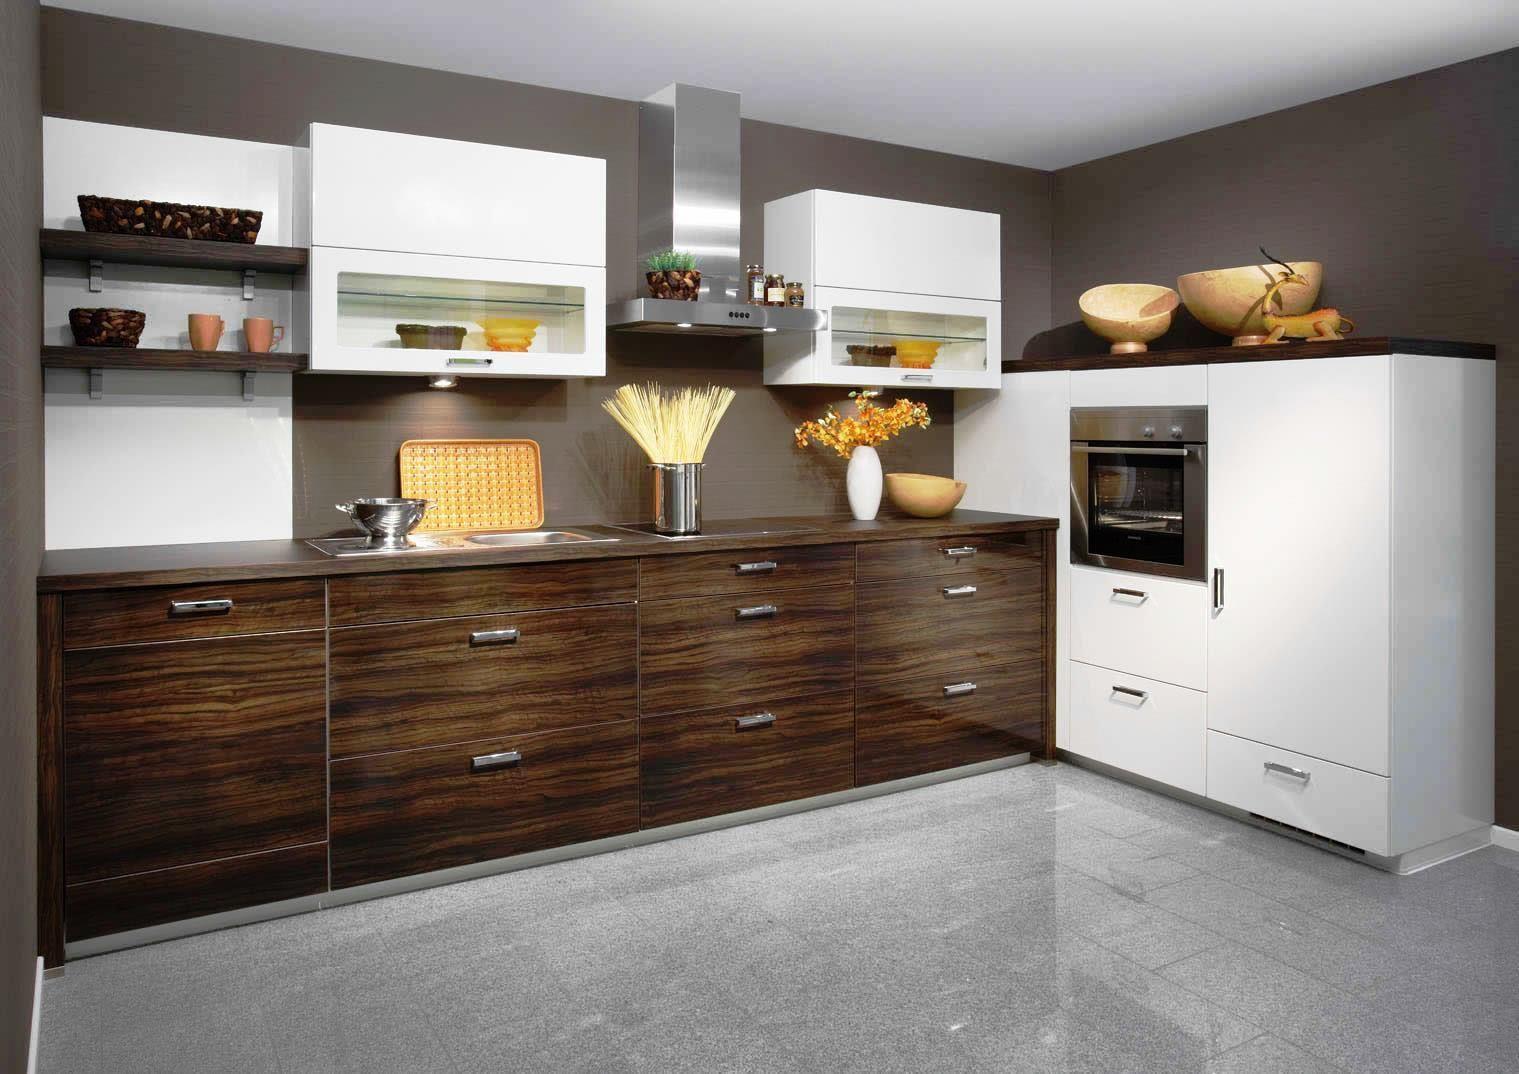 High Gloss Kitchen Cabinets Top High Gloss White Kitchen Cabinets